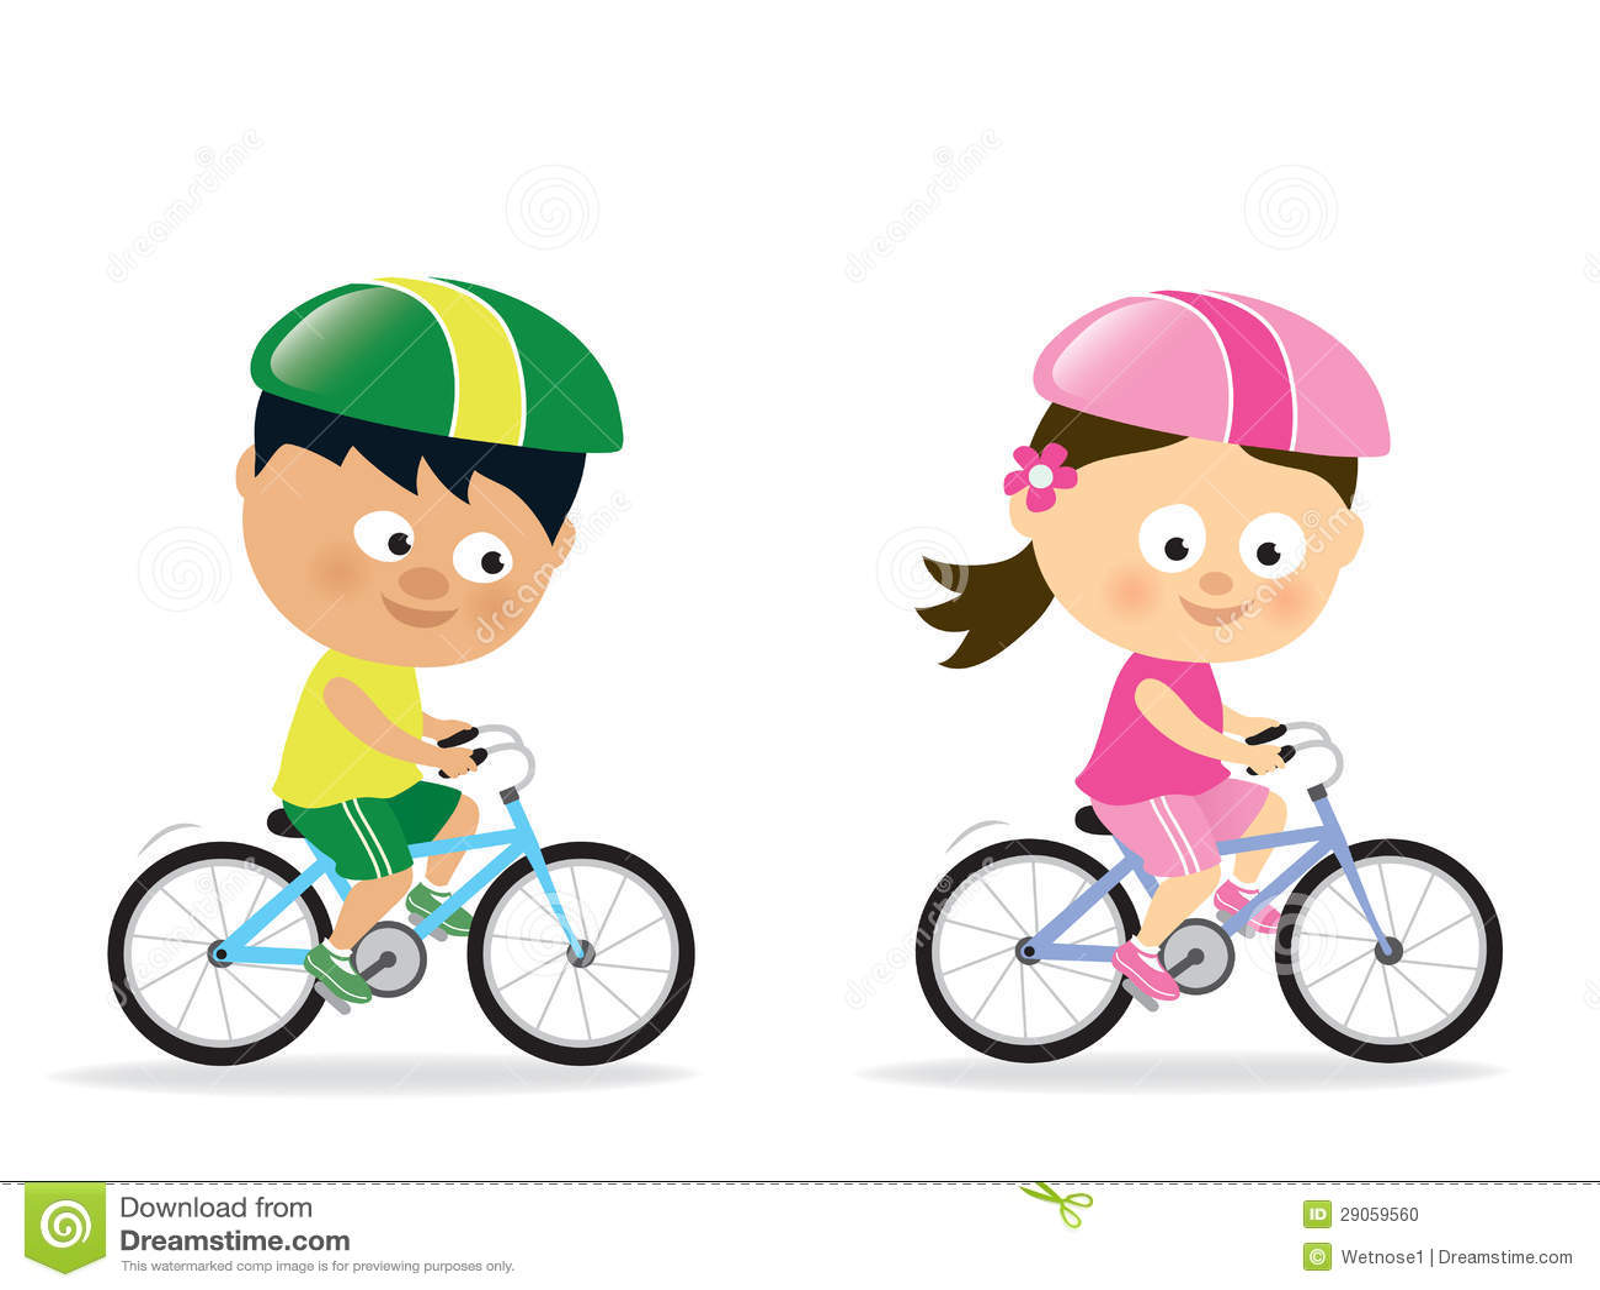 Child Riding A Bike Clipart